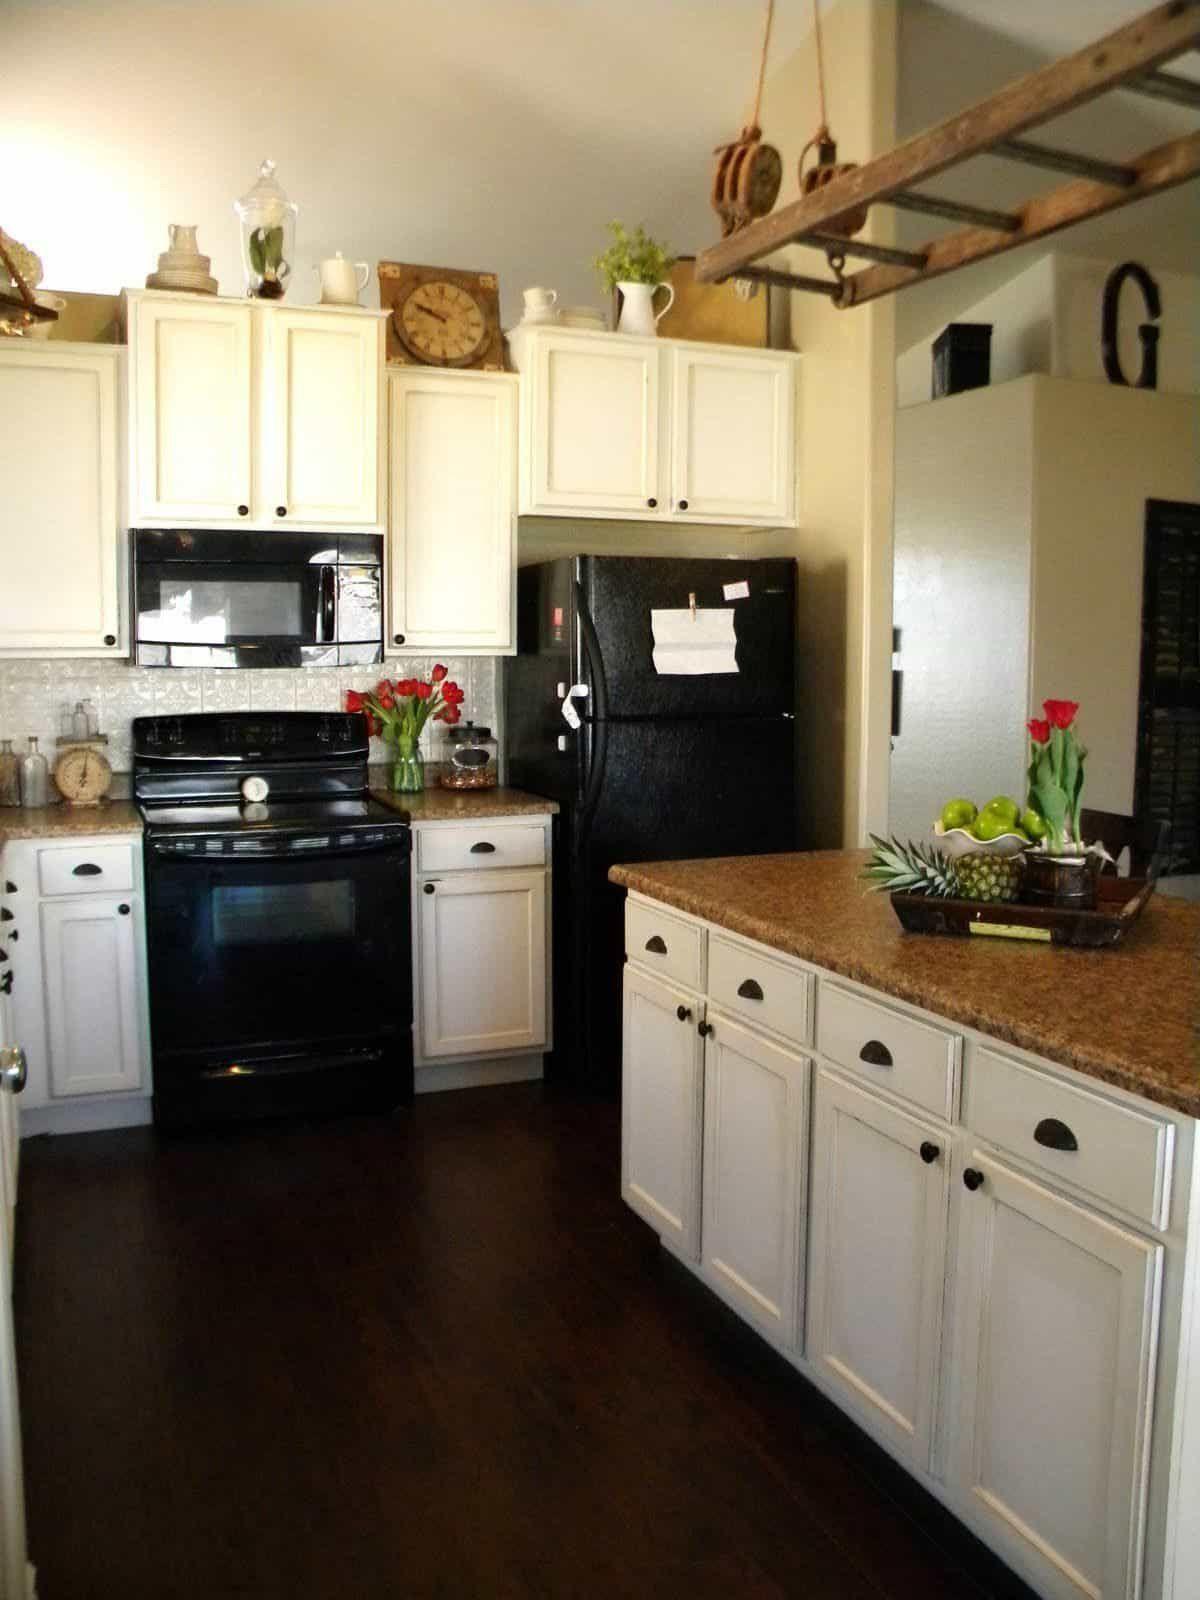 77 white cabinets black appliances  kitchen decor theme